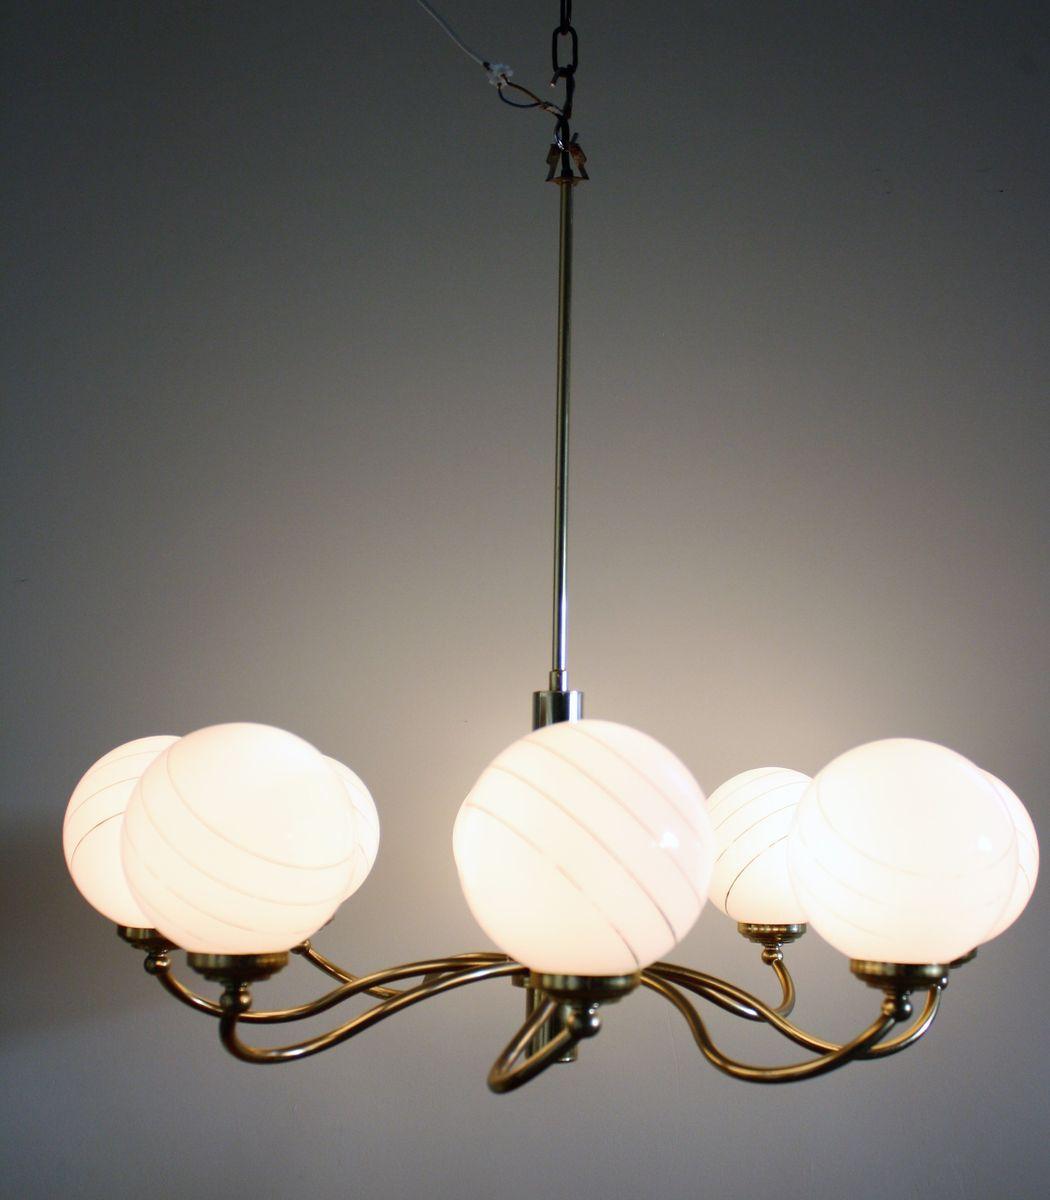 vintage messing opalglas kronleuchter mit 8 leuchten 1960er bei pamono kaufen. Black Bedroom Furniture Sets. Home Design Ideas